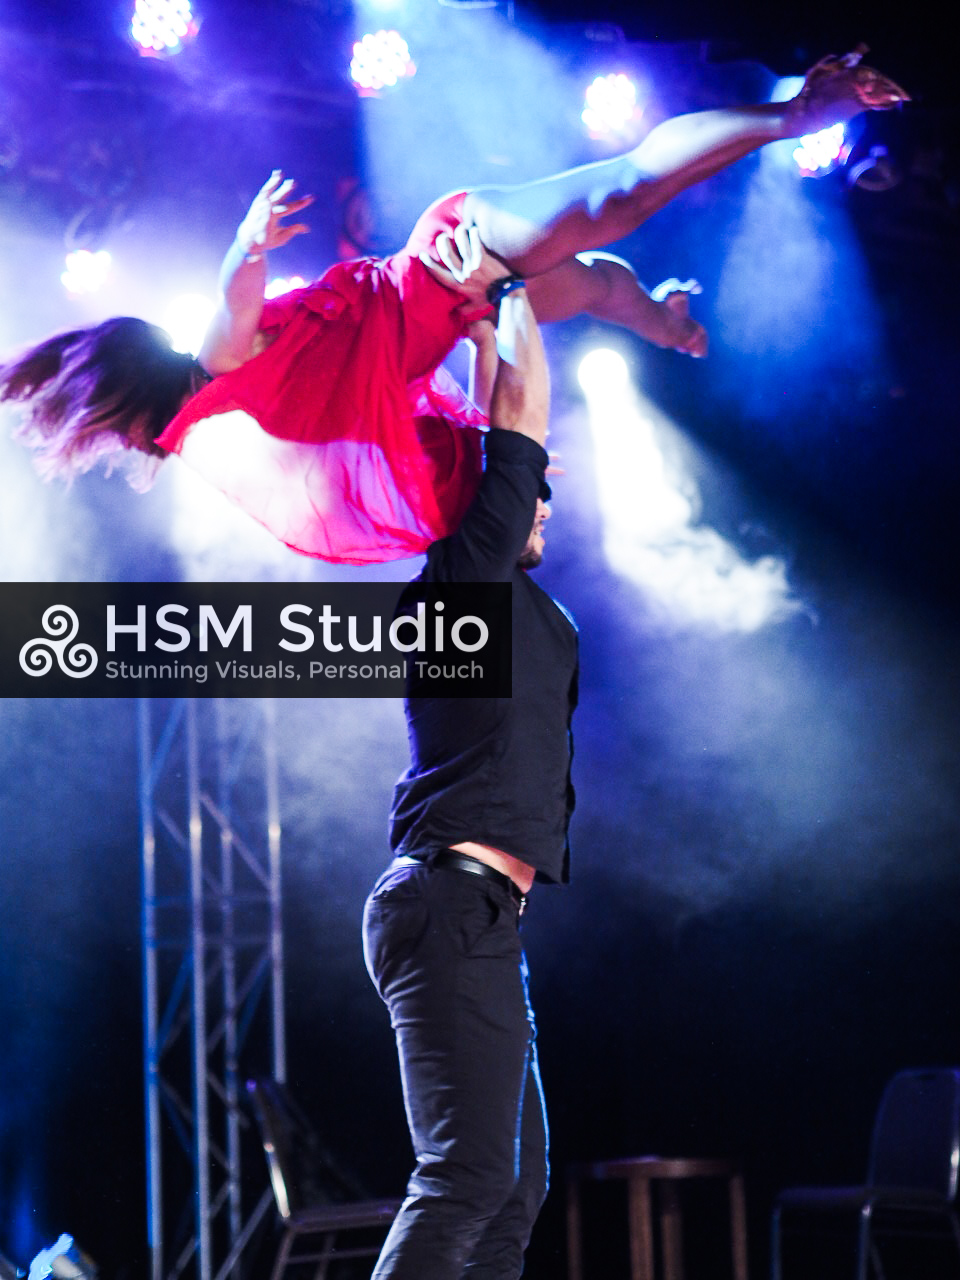 HSM Studio (4290671).jpg